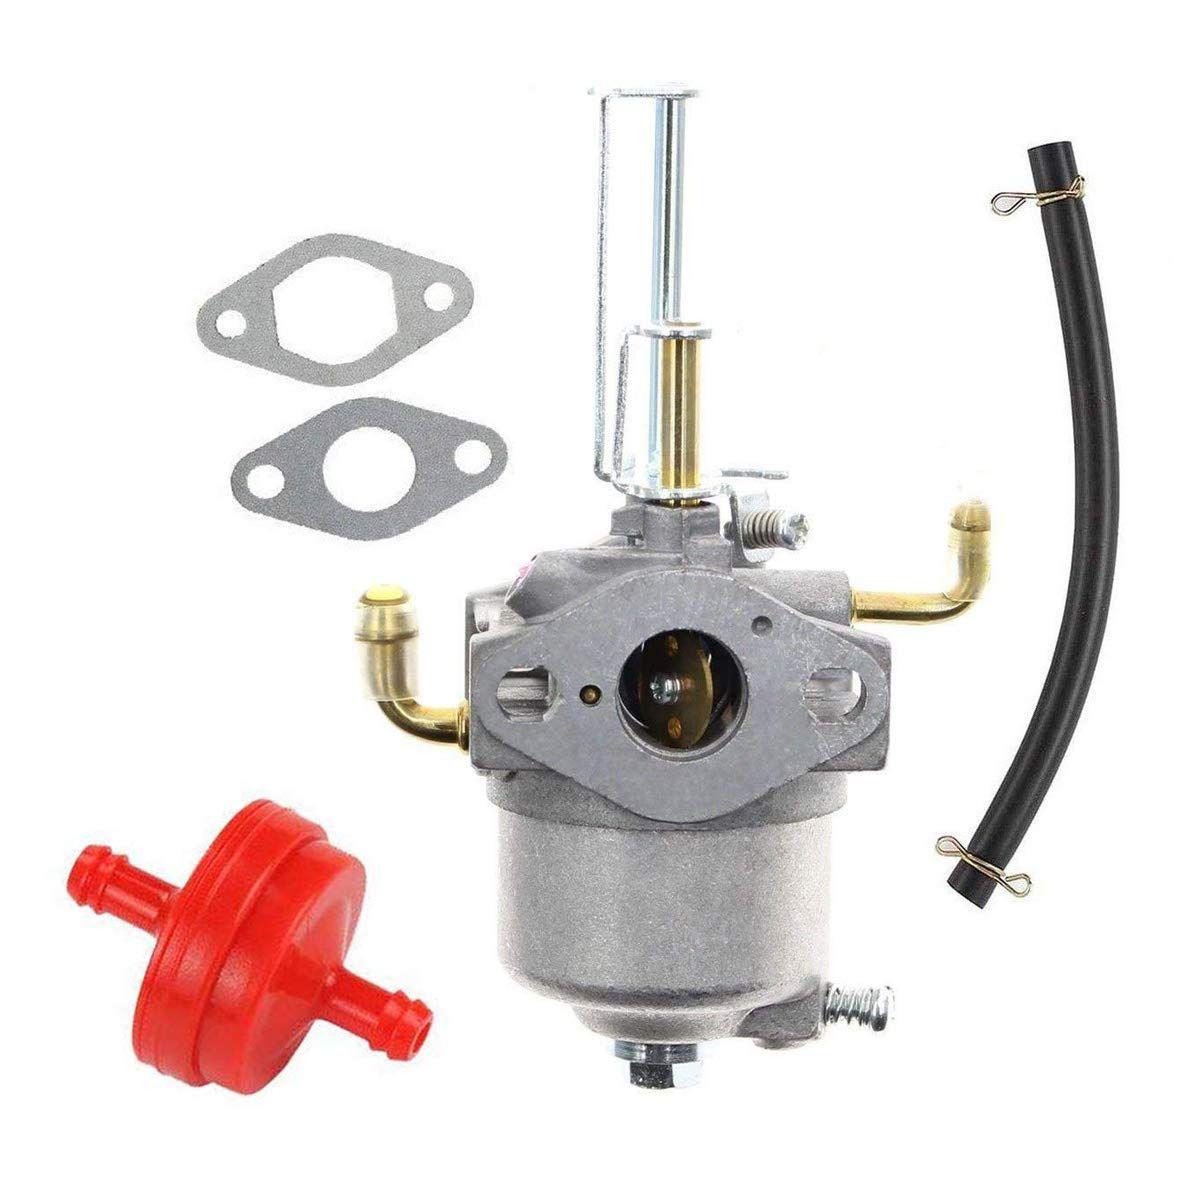 hqparts carburetor carb and fuel filter for carburetor for toro 38587 38272 38282 38452 snow blower [ 1200 x 1200 Pixel ]